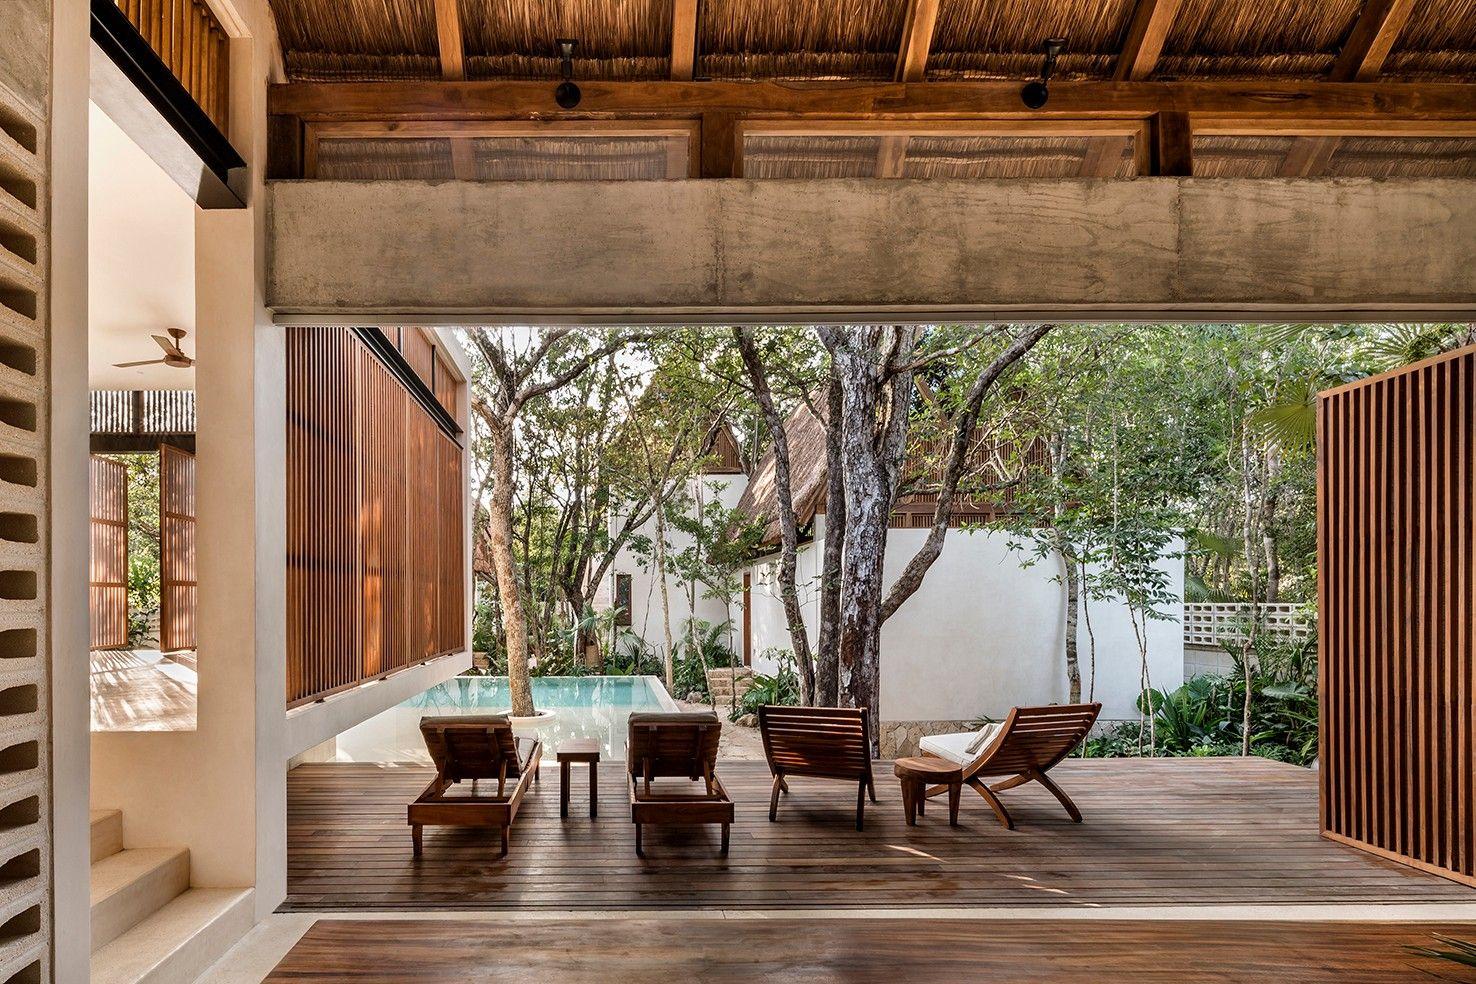 新作 | Jaque Studio:玛雅丛林的小型精品酒店Jungle Keva hotel